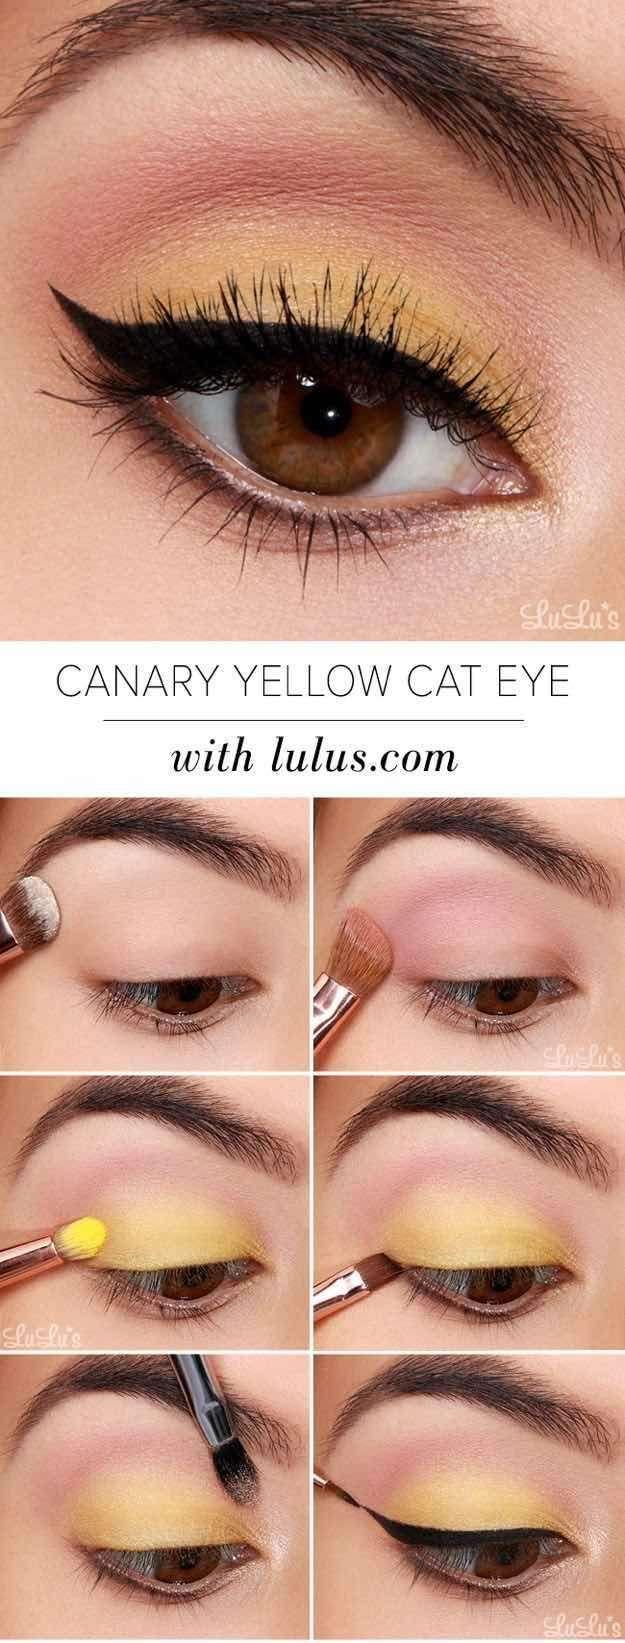 4. Yellow Eyeshadow - Cheerful Yellow Eyeshadow Tutorial for Beginners | Makeup Tutorial | 12 Colorful Eyeshadow Tutorials For Beginners